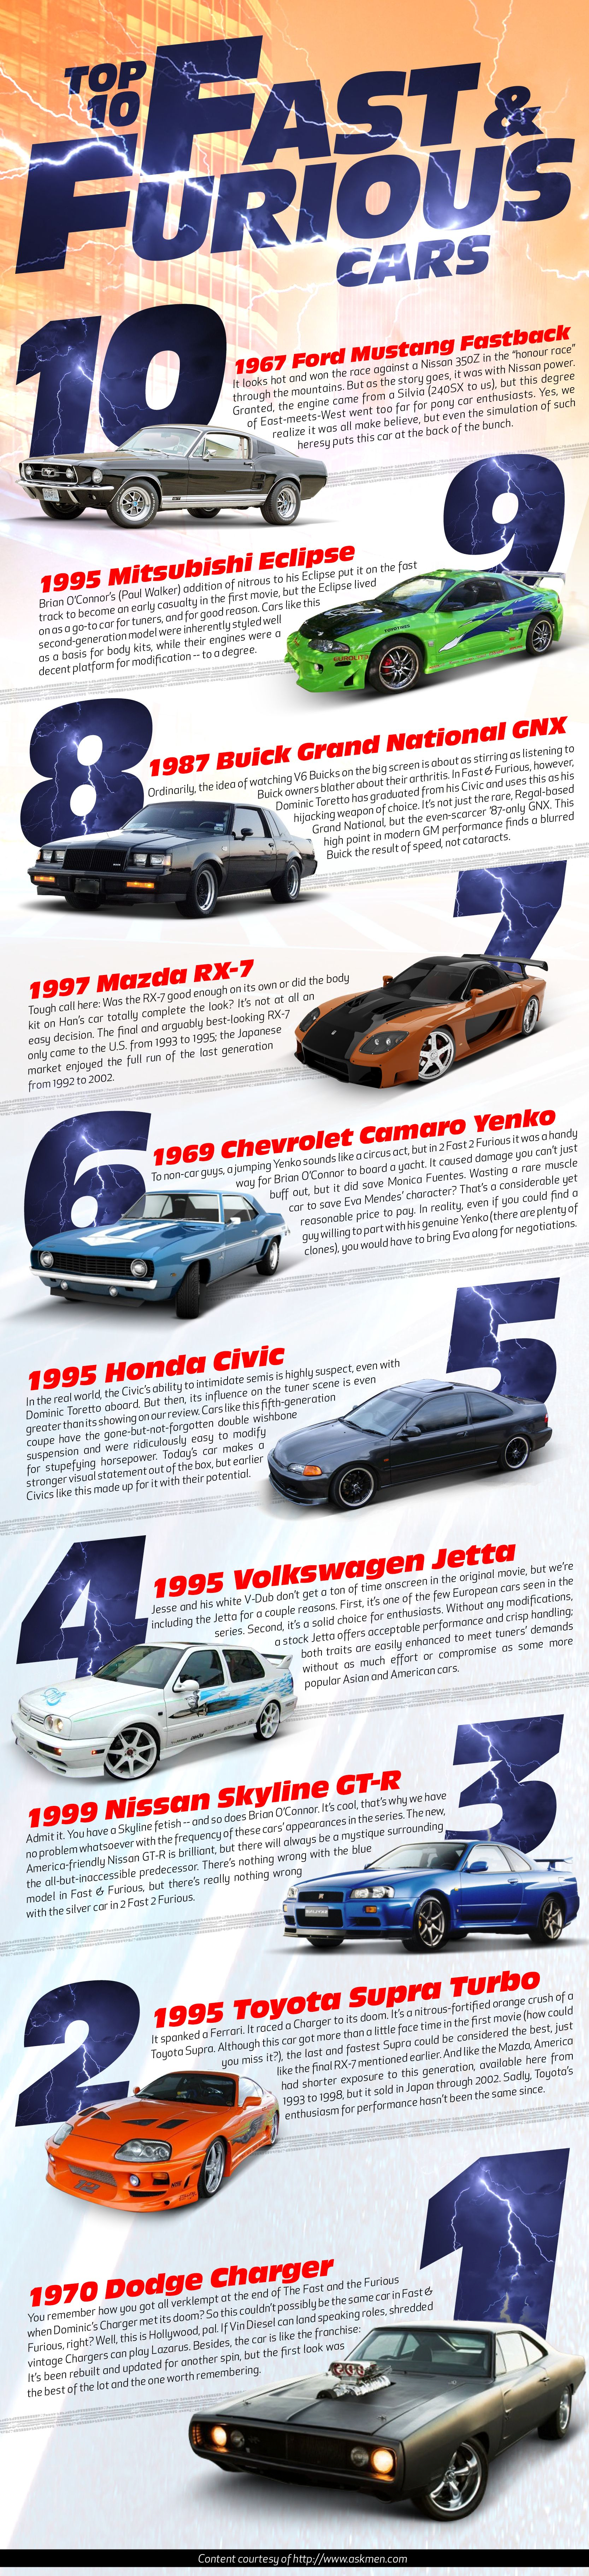 Infographic: Top 10 (Velozes e Furiosos)